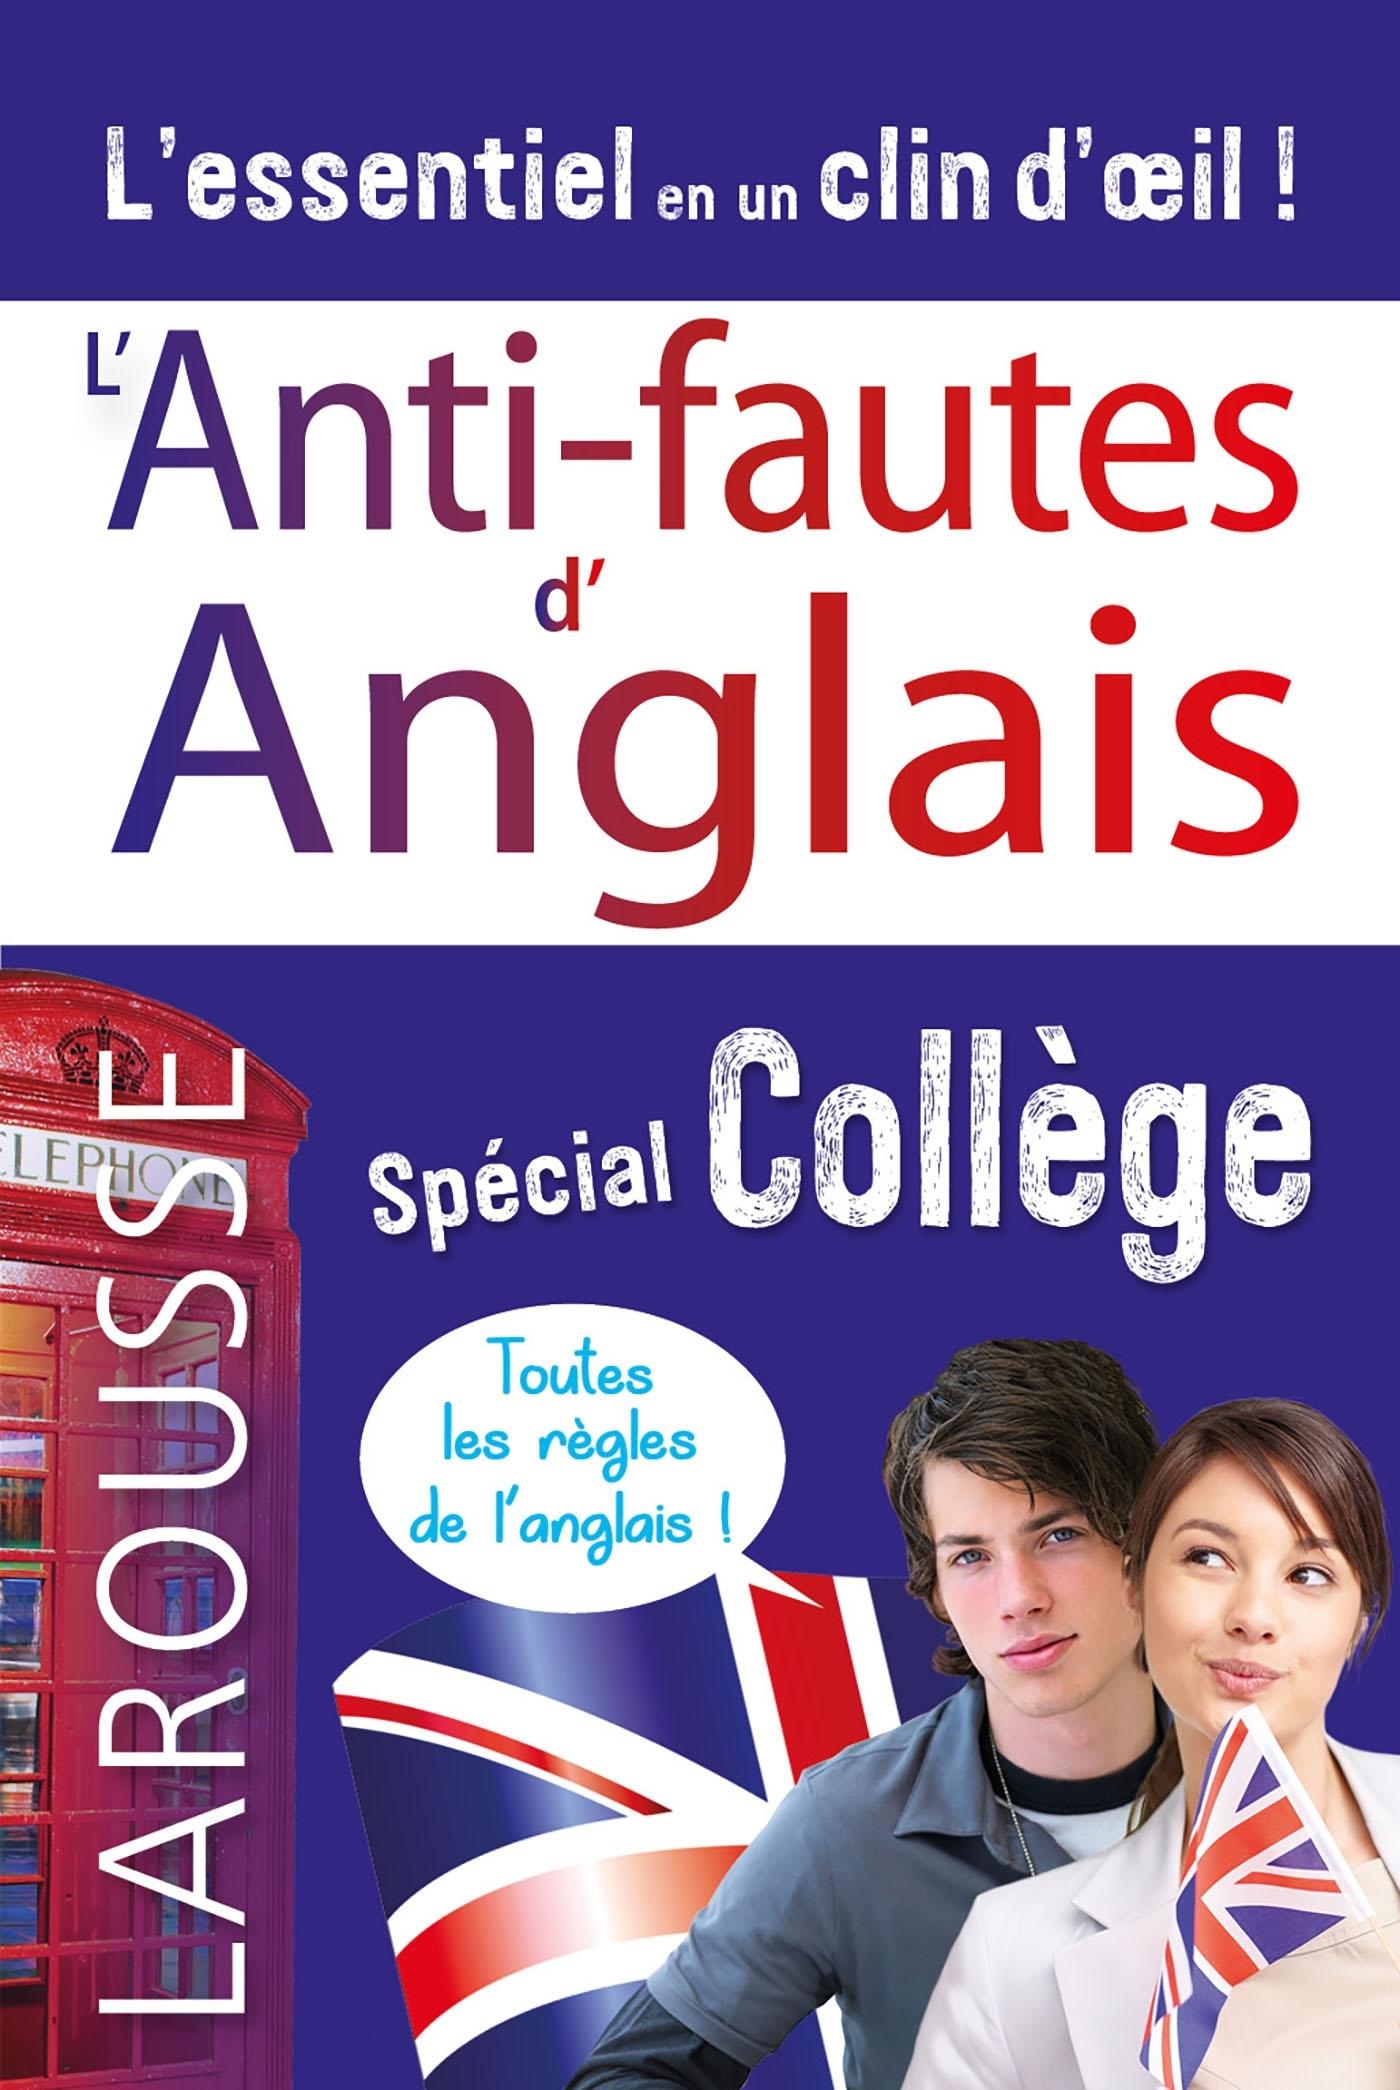 L'ANTI-FAUTES D'ANGLAIS, SPECIAL COLLEGE